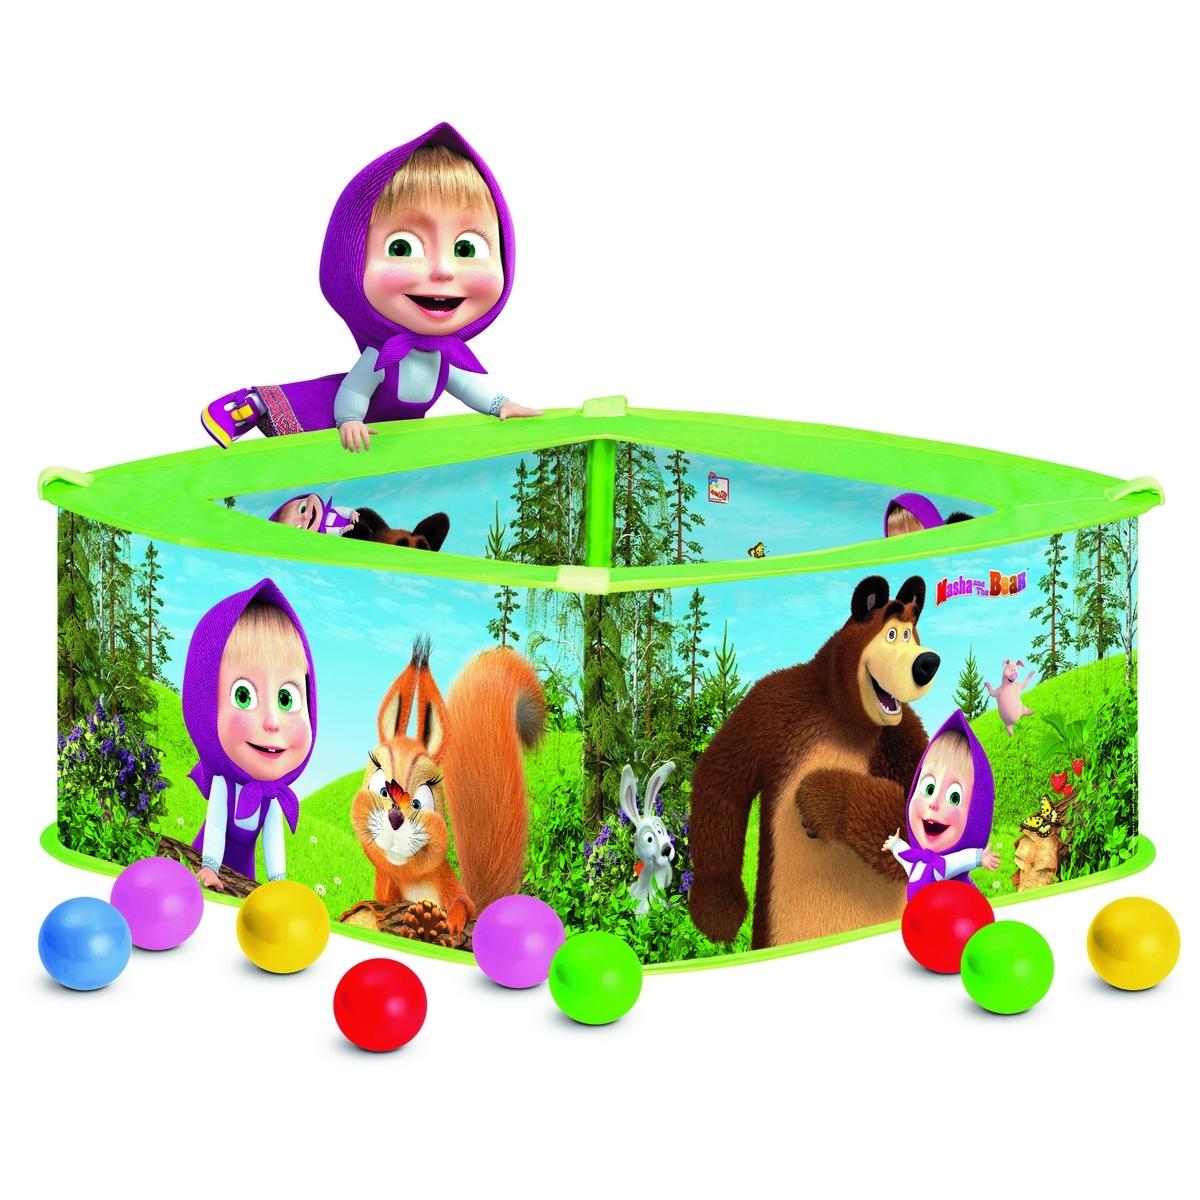 Bino Bazén s balonky Máša a medvěd, 30 x 75 x 75 cm